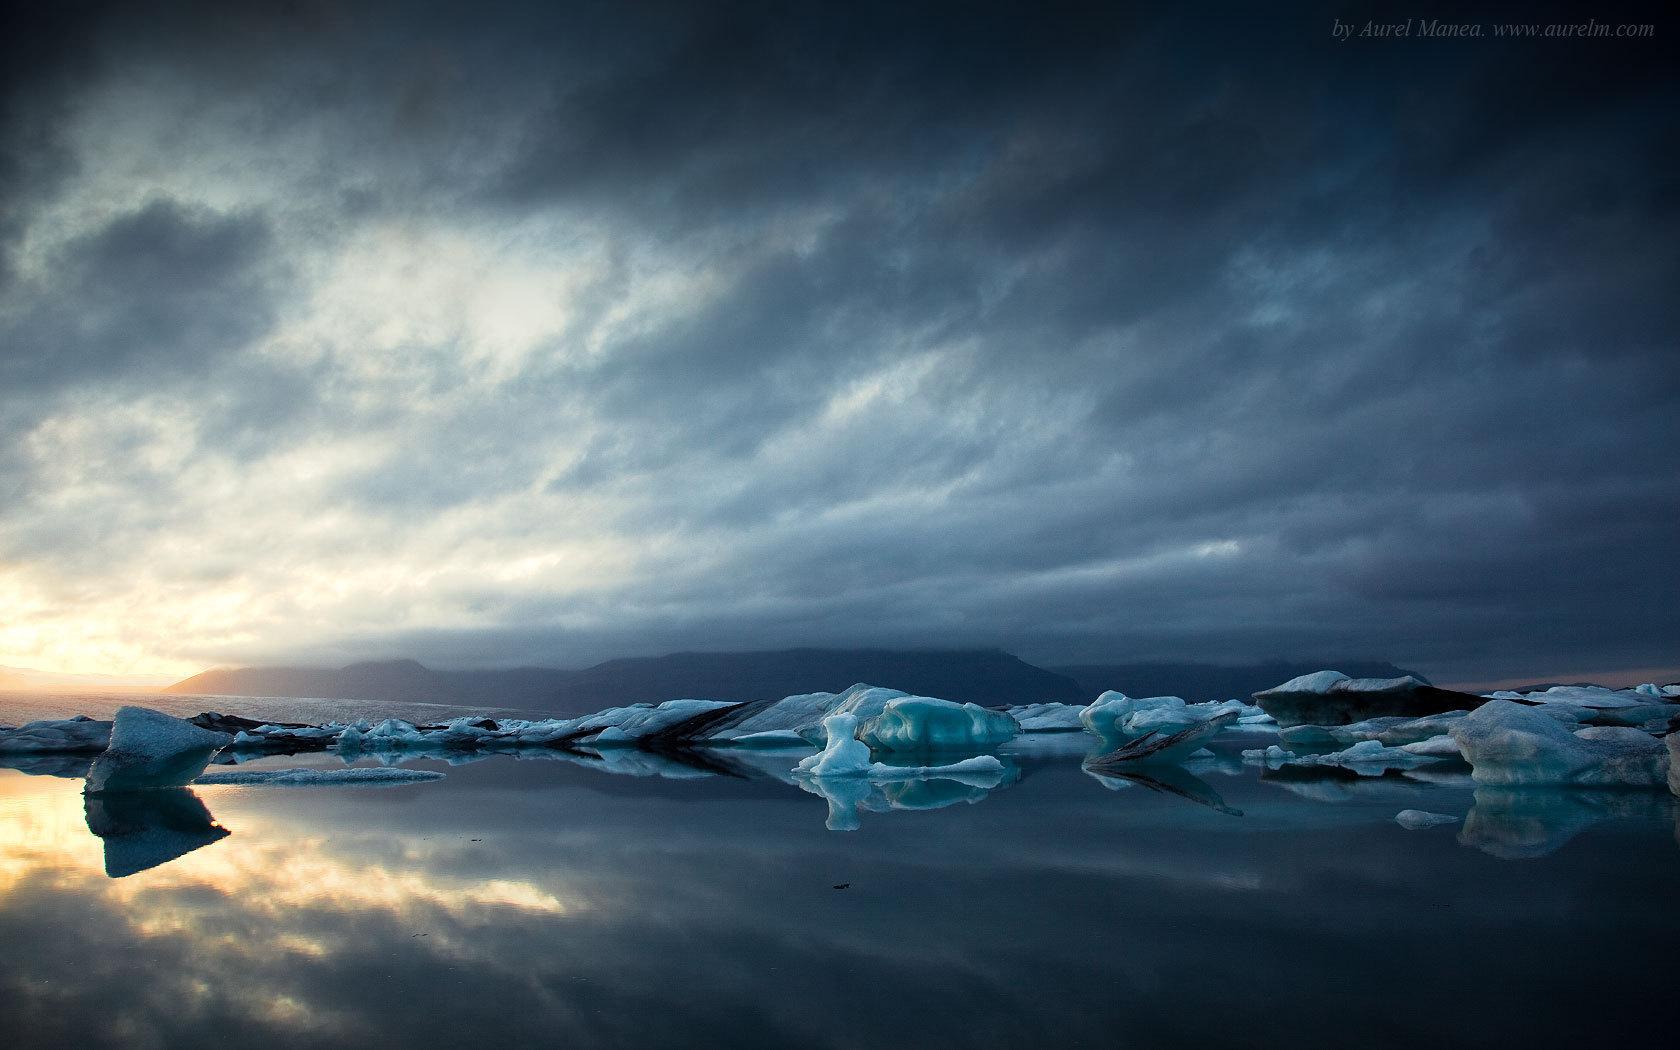 Beautiful iceland wallpaper wallpapersafari - Iceland iphone wallpaper ...